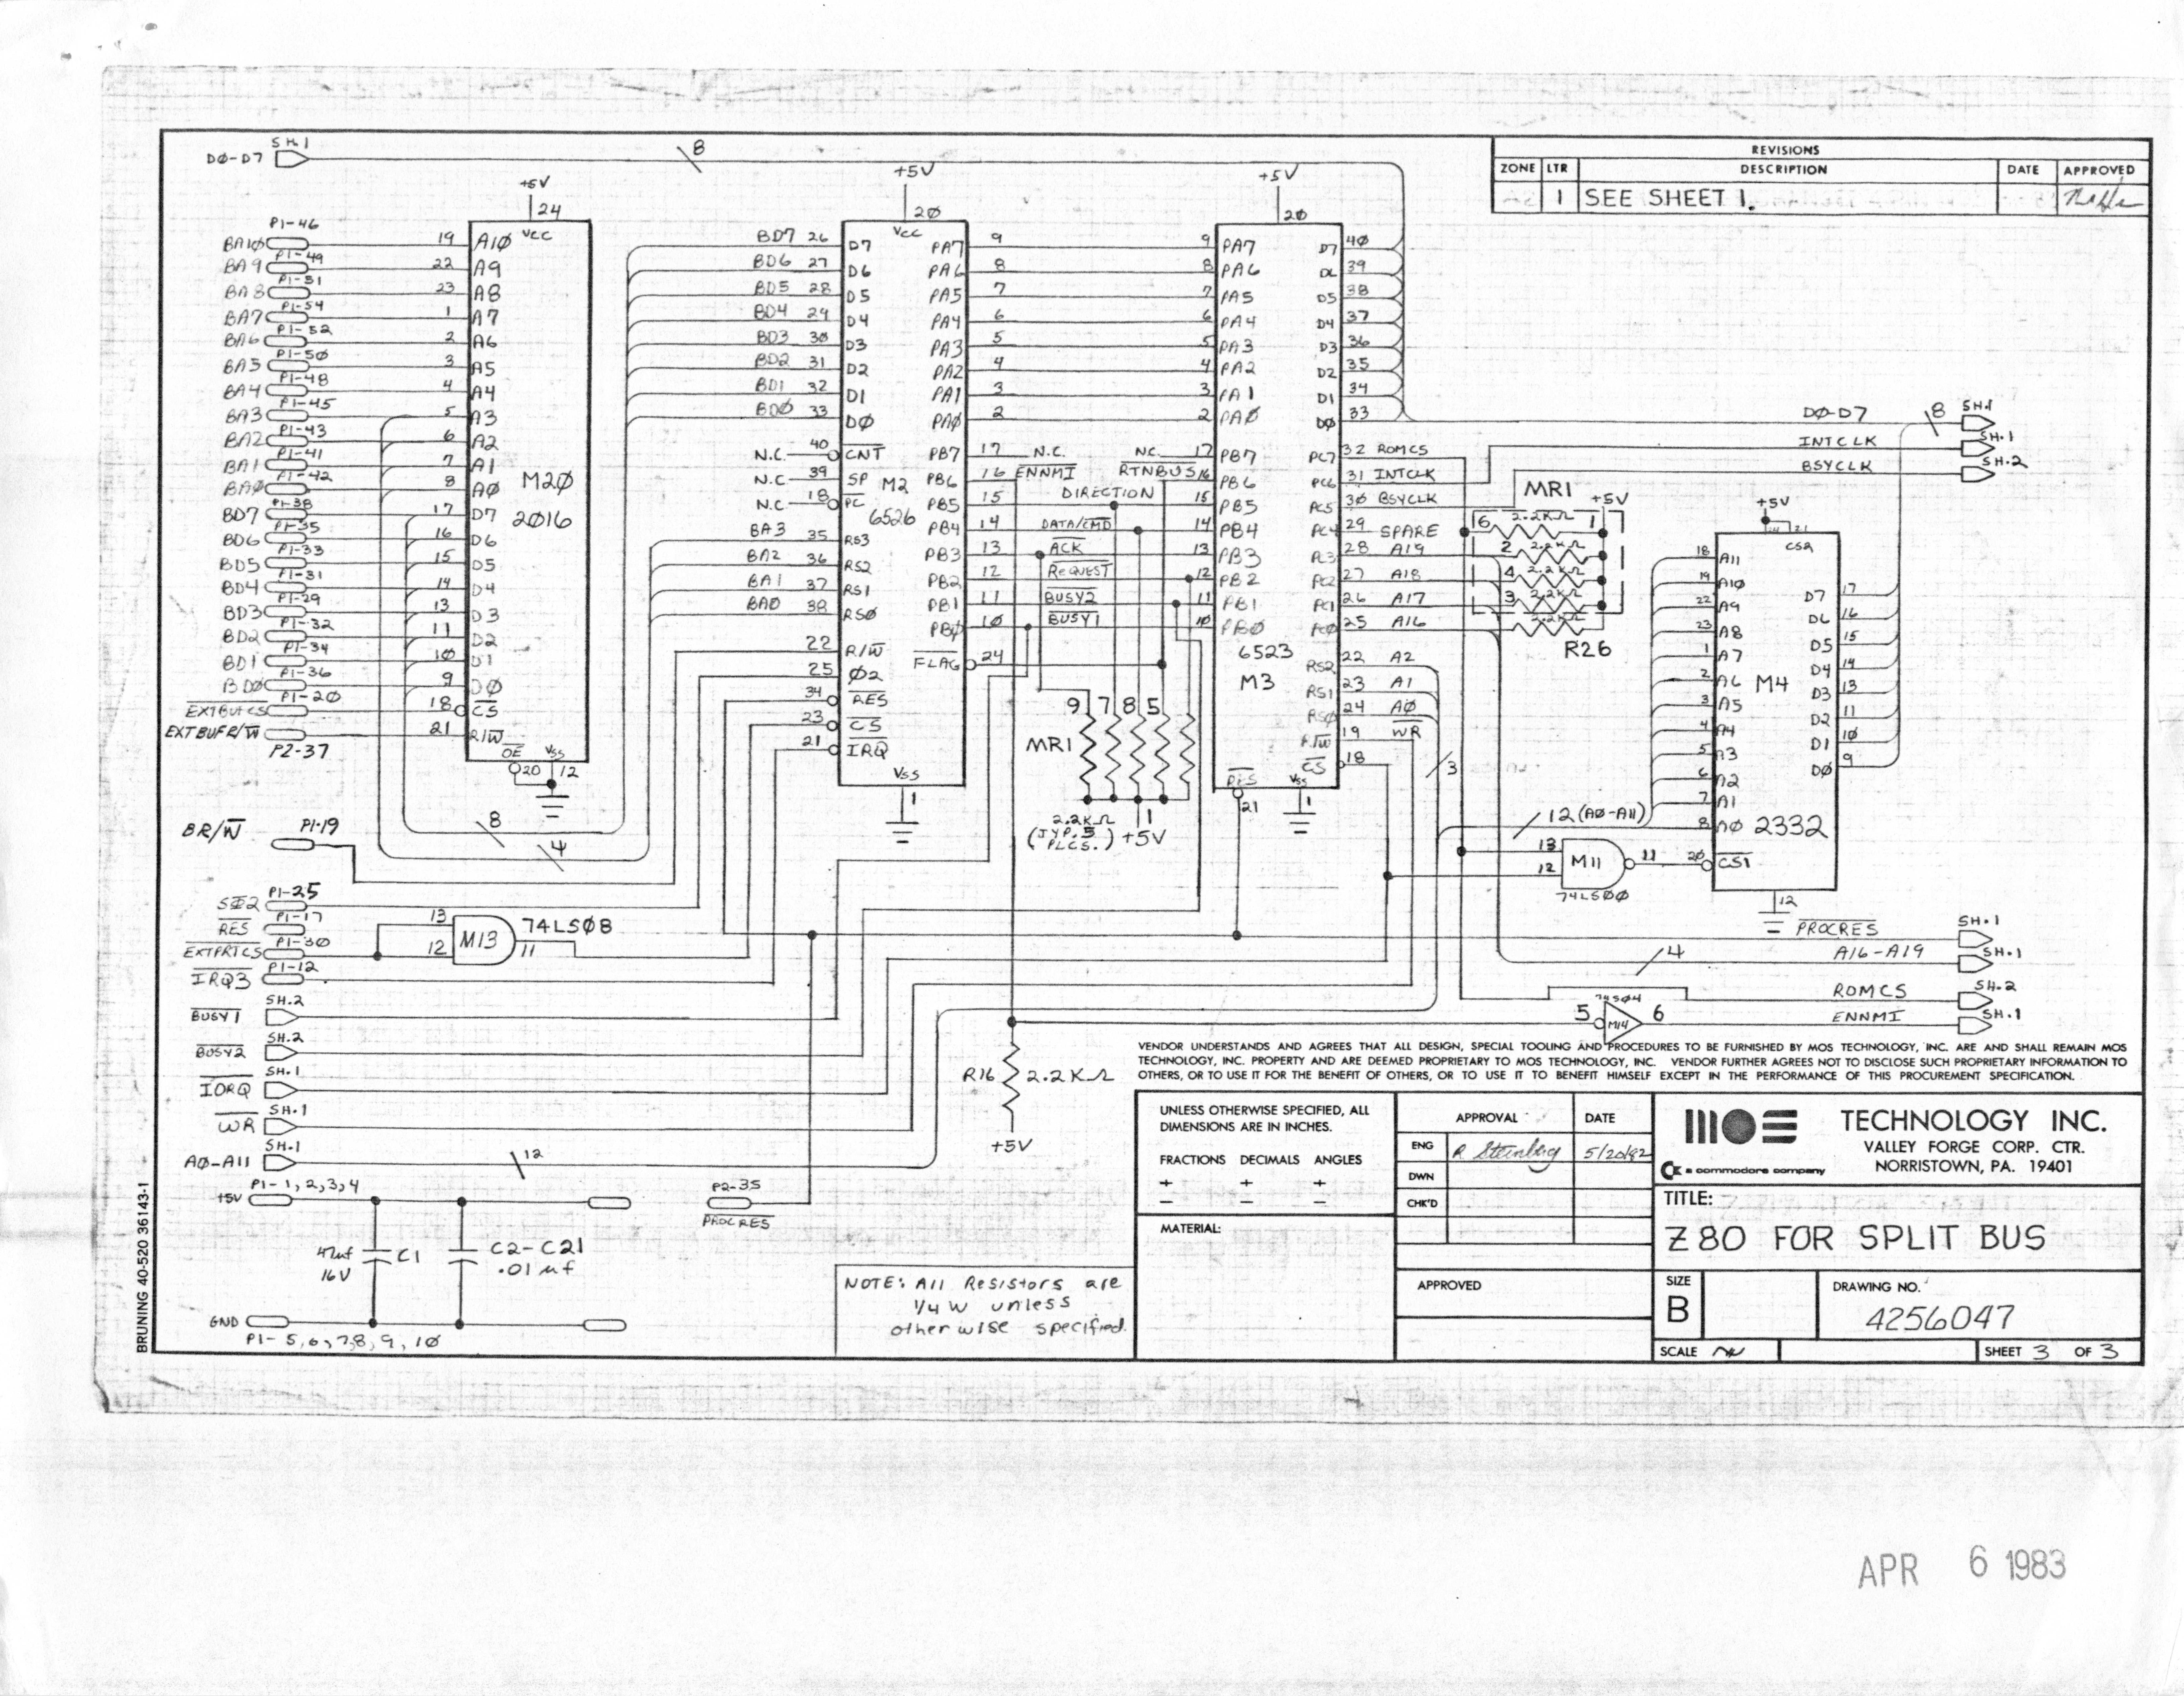 Pub Cbm Schematics Index Circuit Board Diagrams 8088 Co Processor For B Series Machines Reverse Engineered By Ruud Baltissen Http Ruudc64org 8256043 01of14 Leftgif Ii Lp Schematic